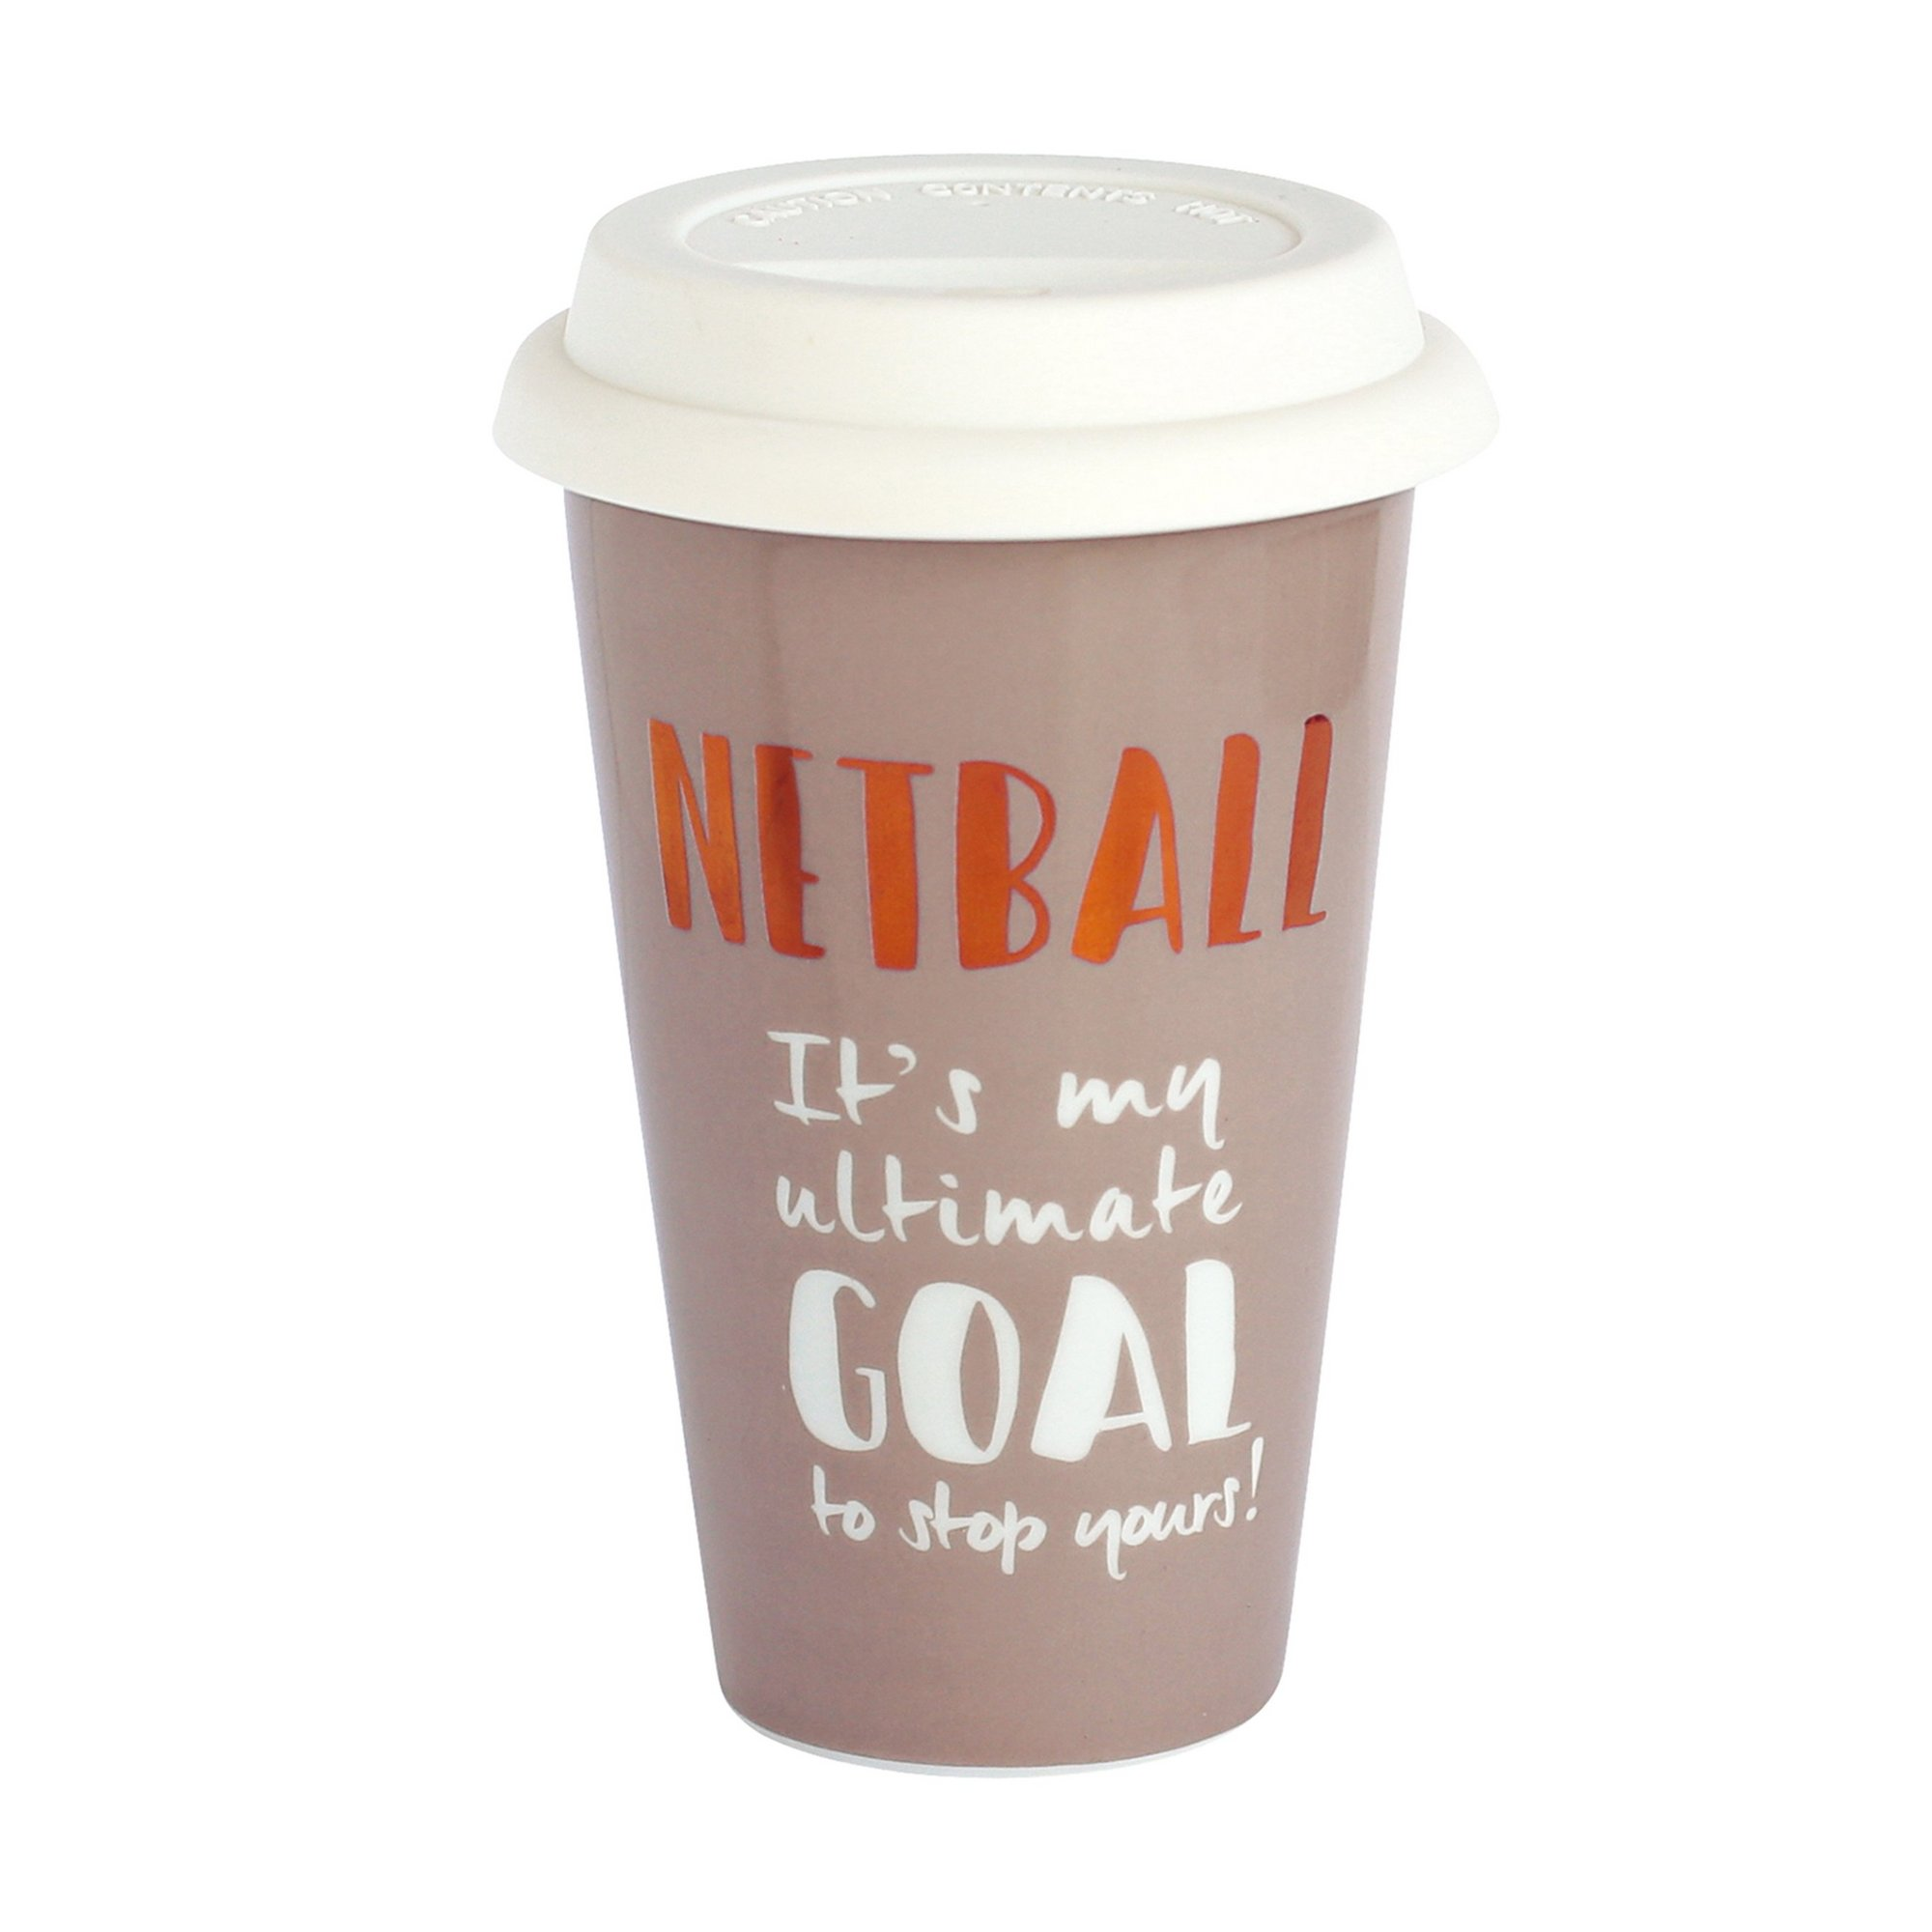 Image of Ceramic Travel Mug - Netball